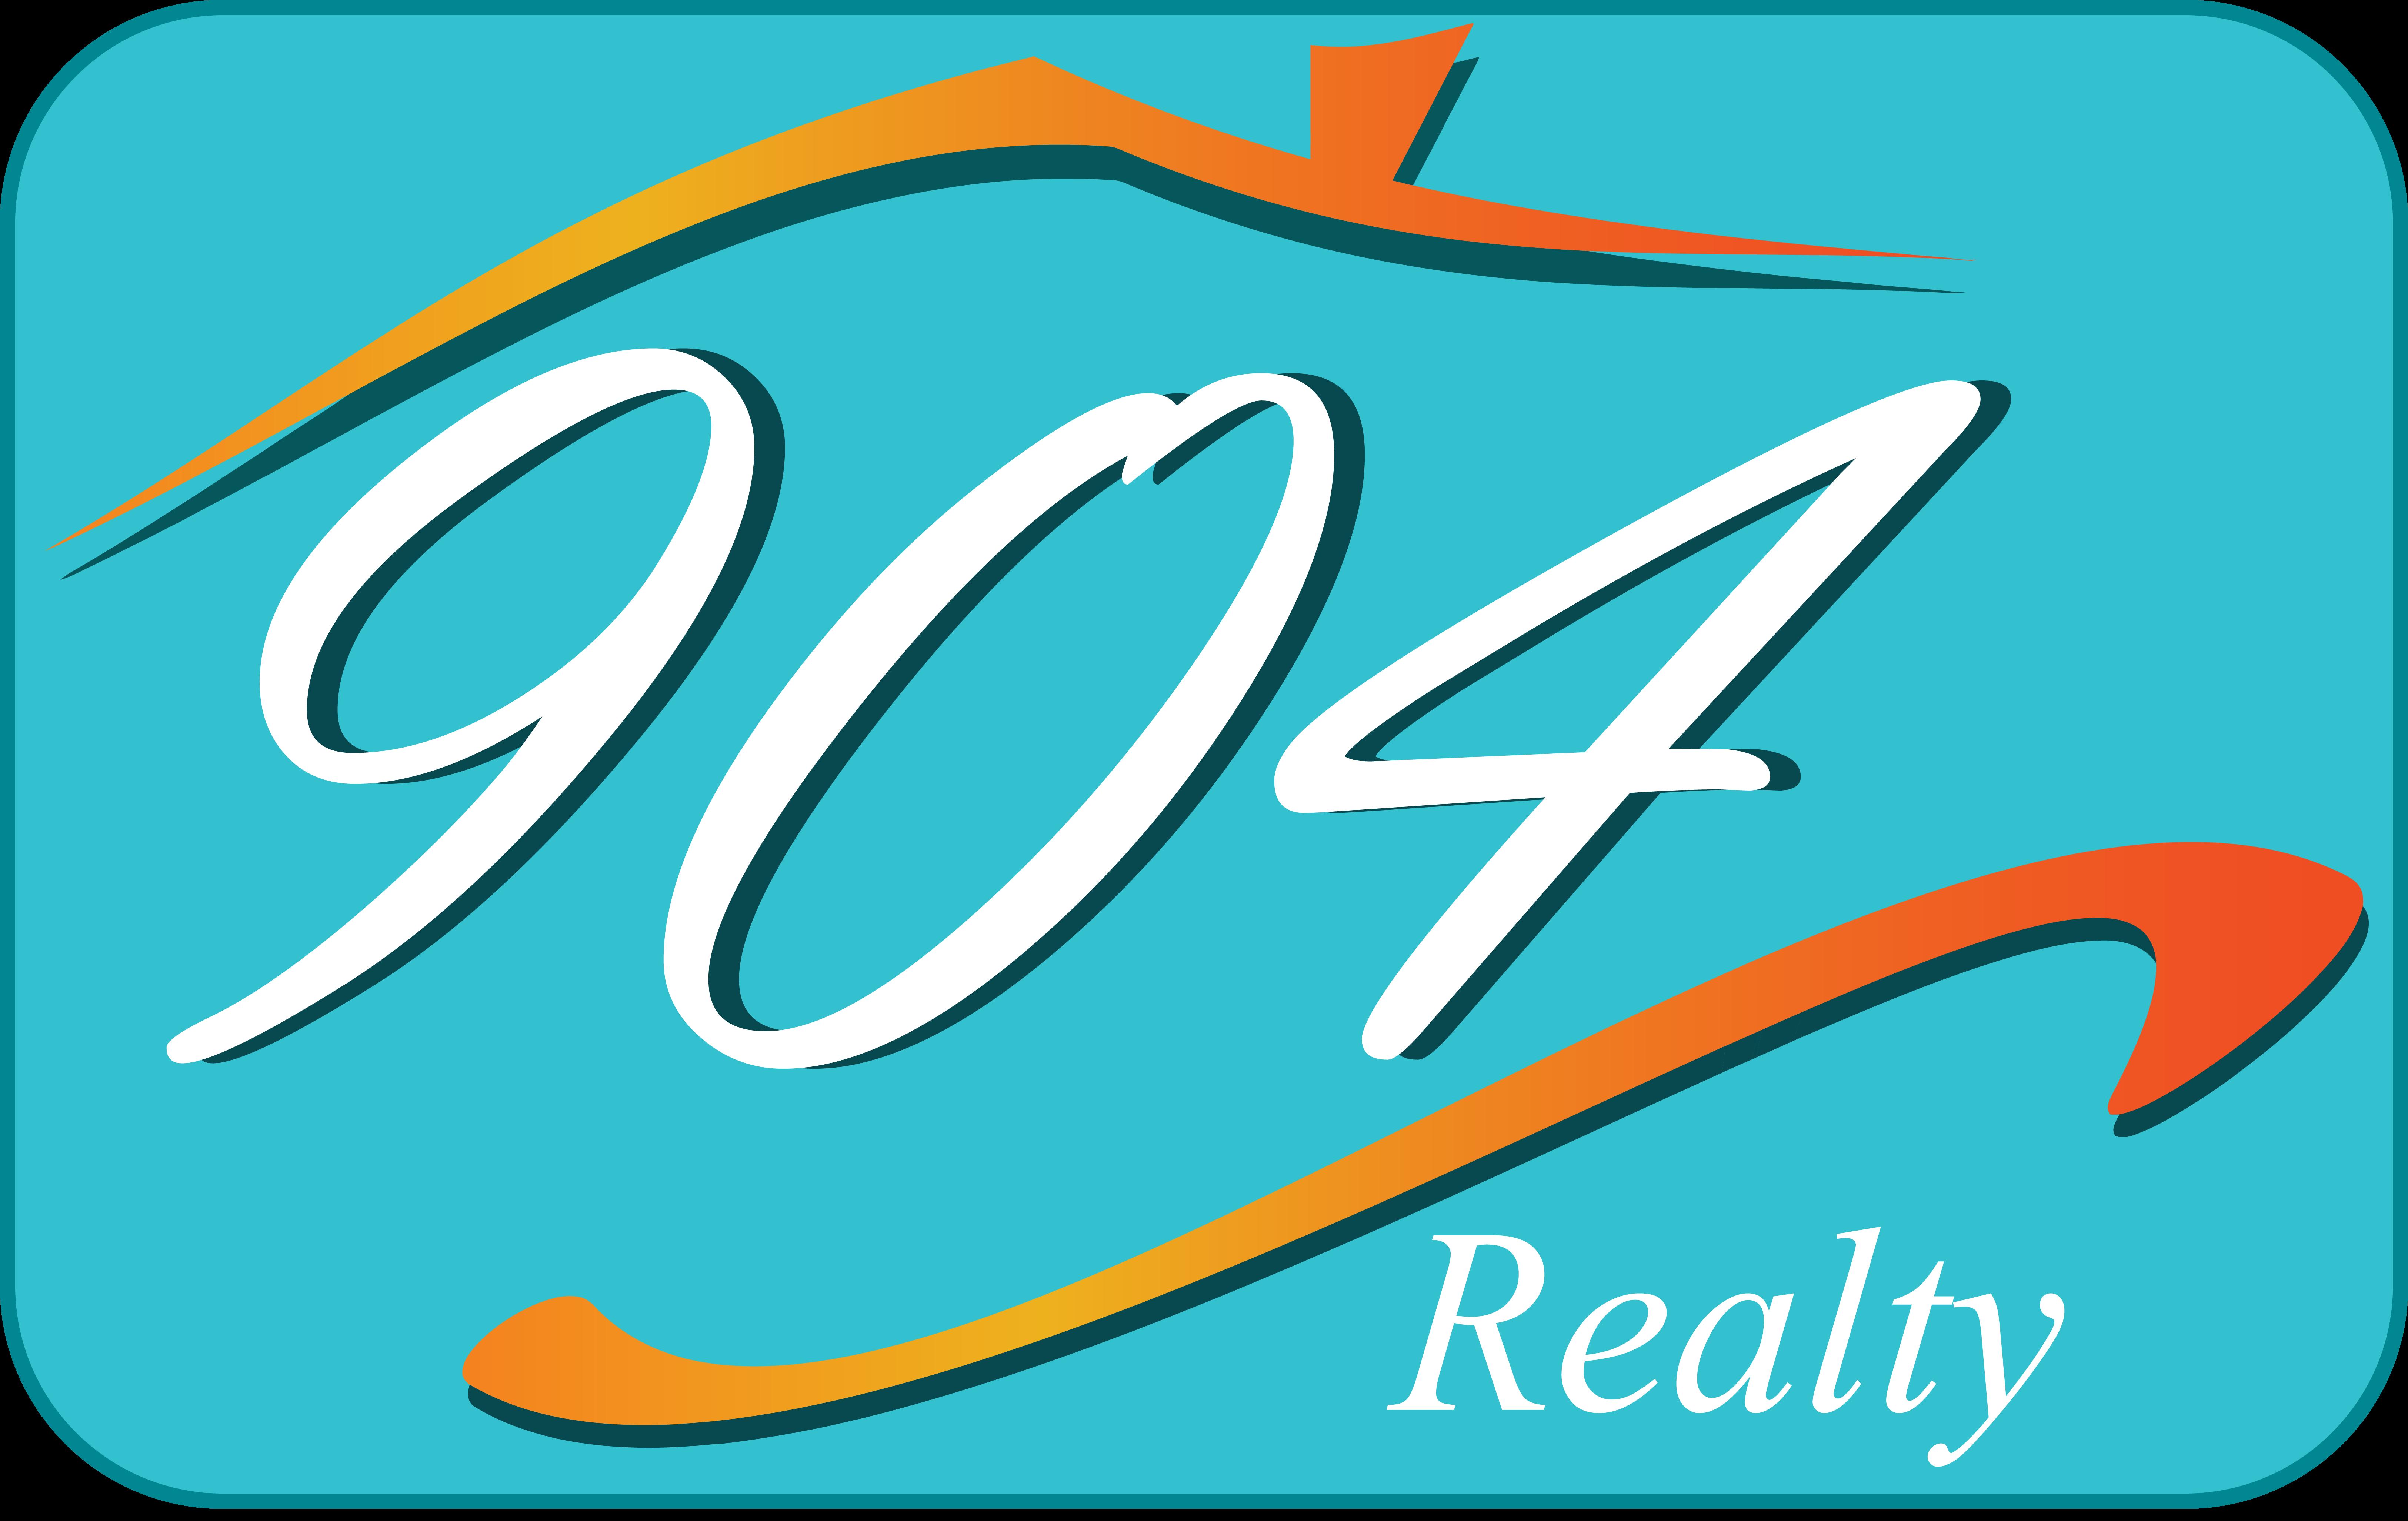 904 Realty, LLC